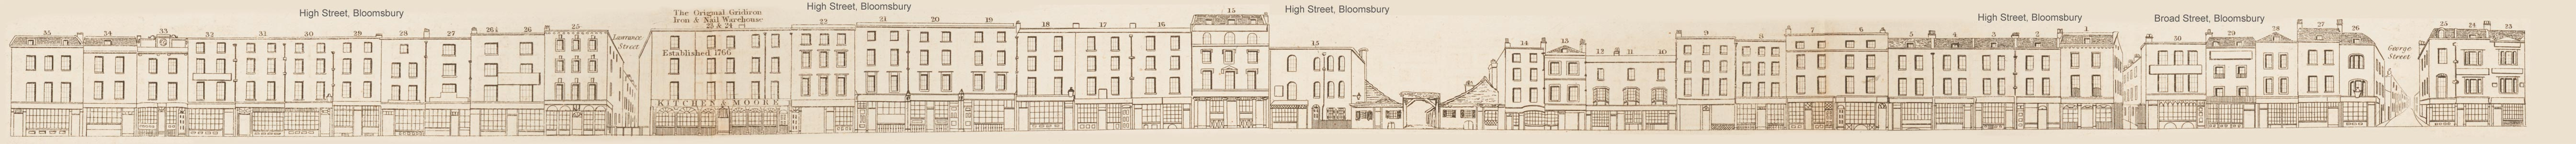 map - Tallis's London street views : No. 27. Broad Street, Bloomsbury (north)